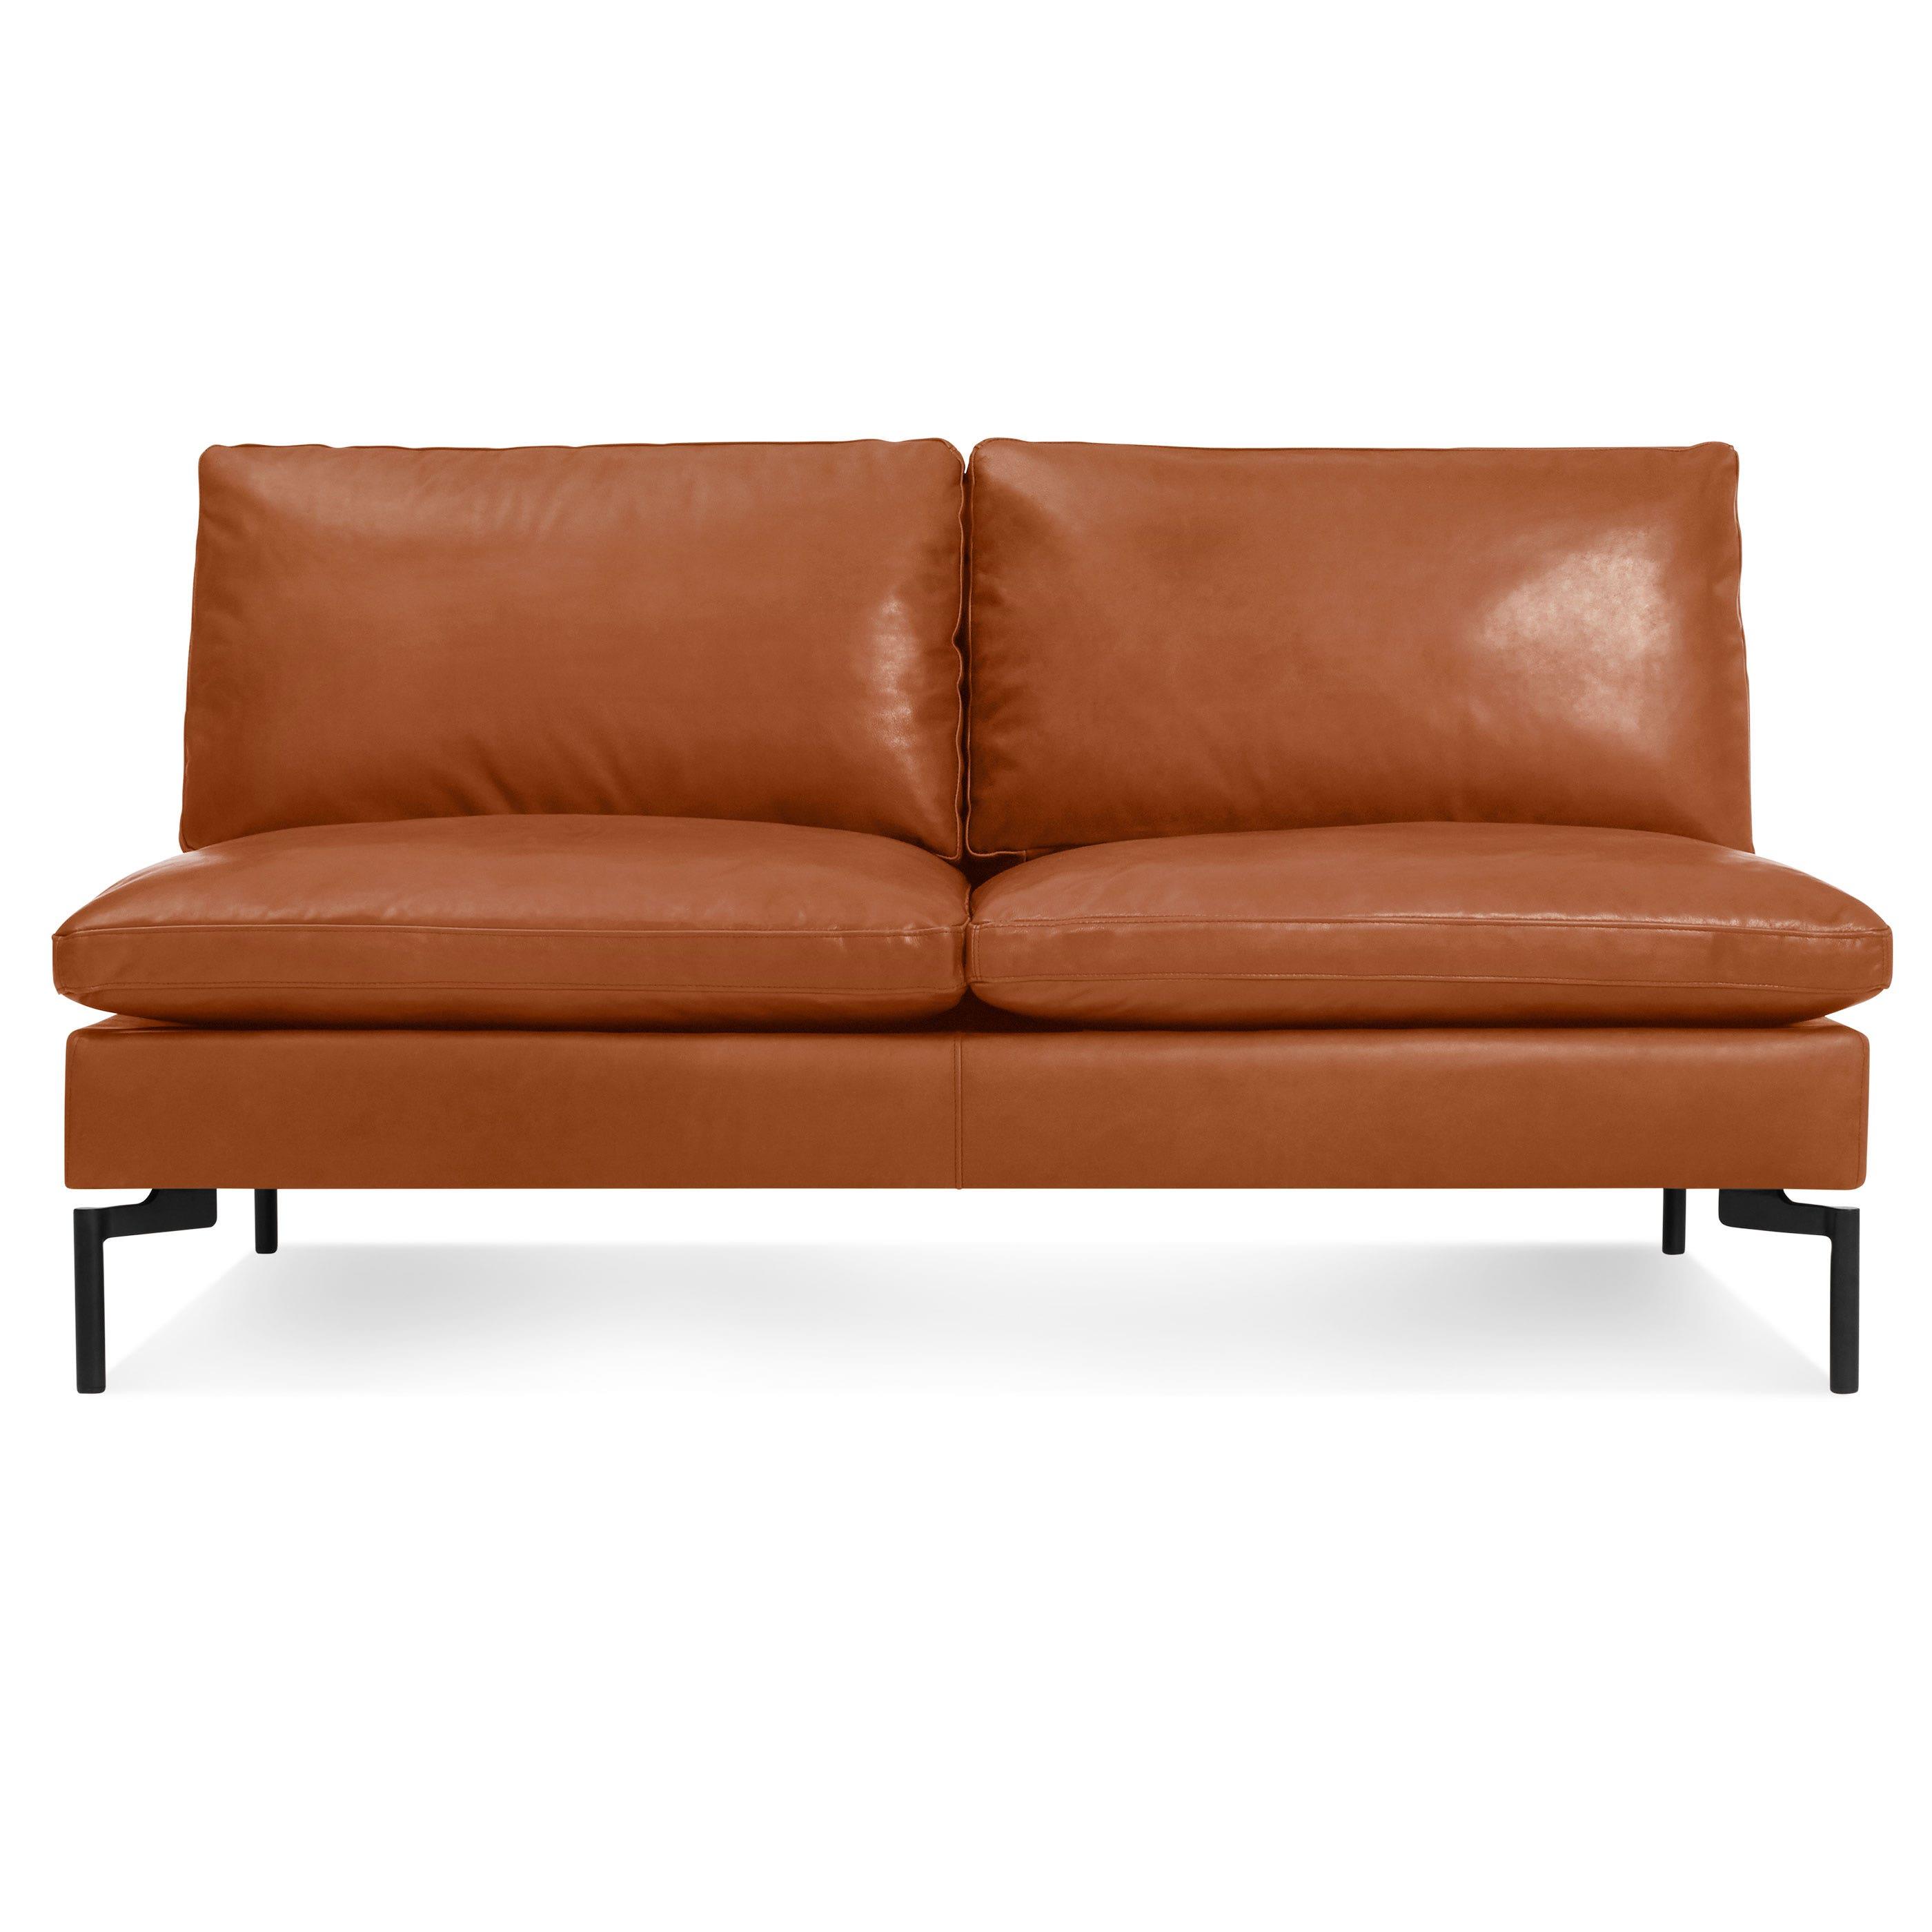 New Standard Armless Leather Sofa